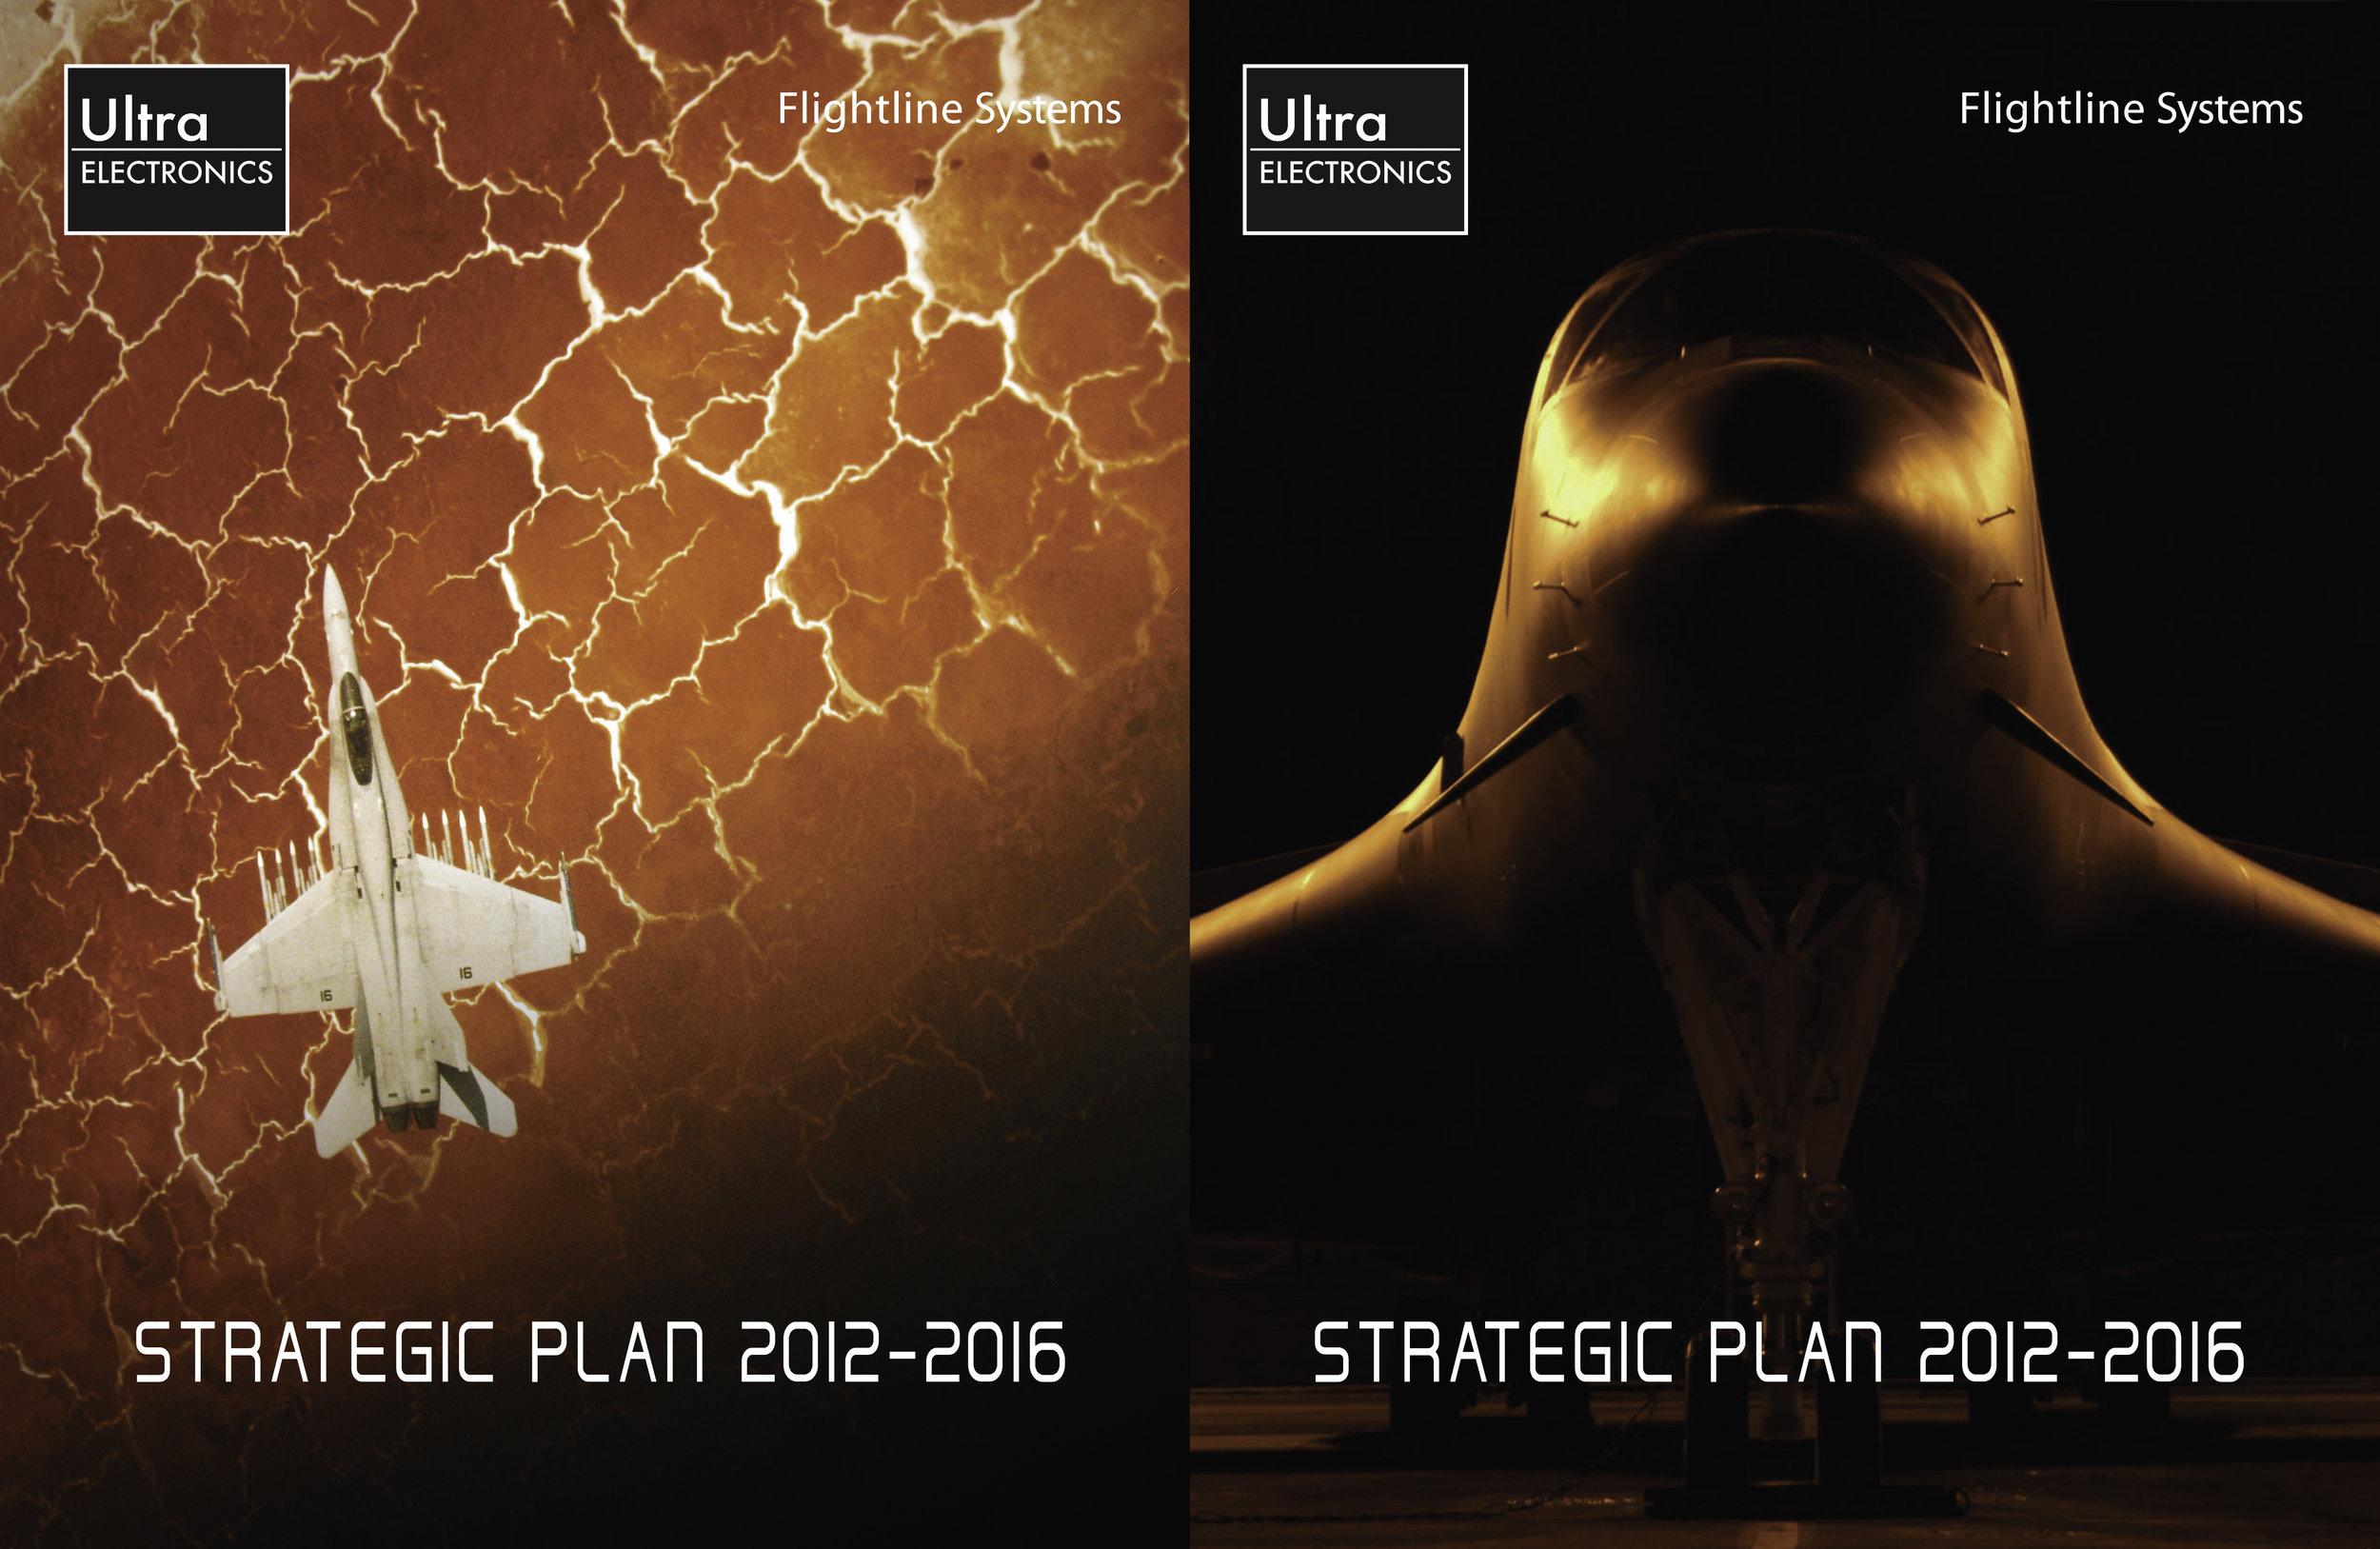 2011 Strat Plan Cover.jpg